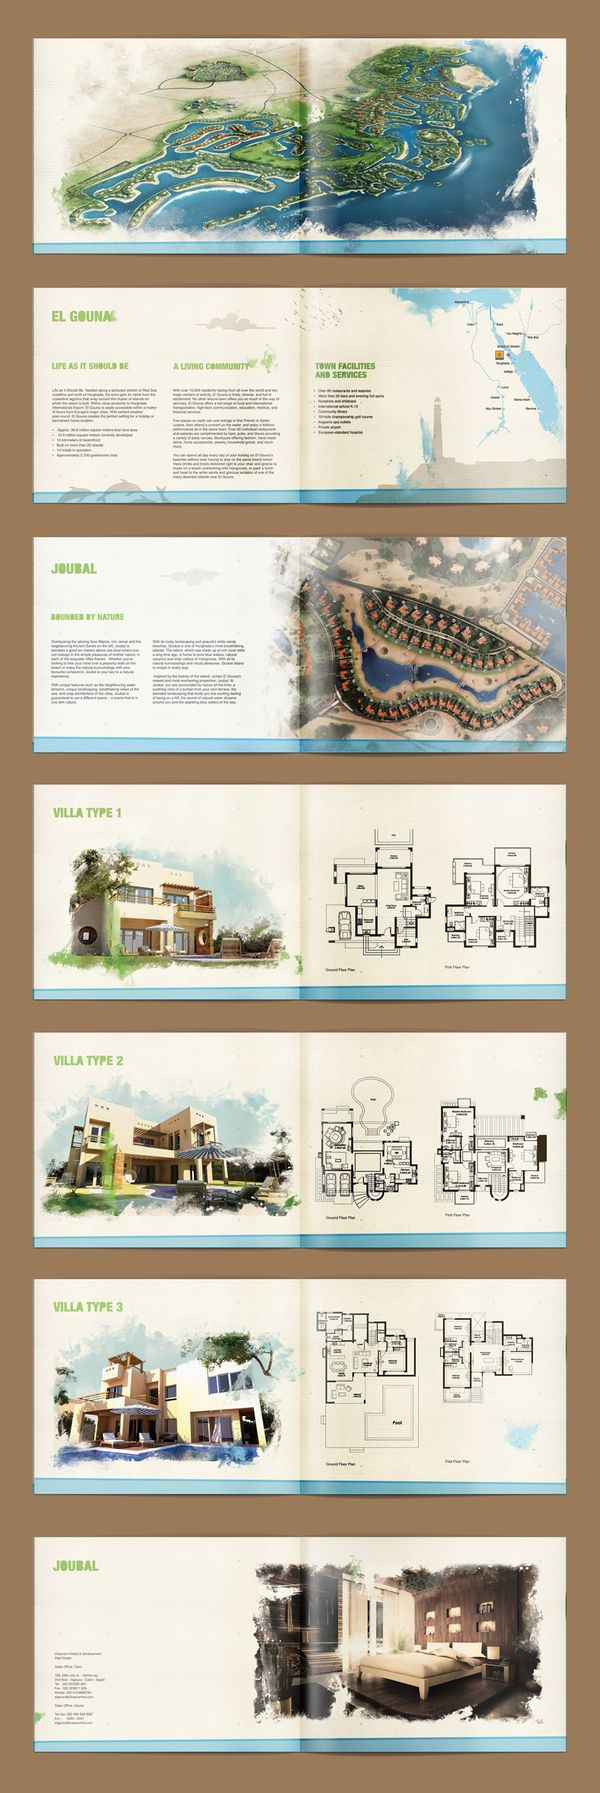 GOUNA and JOUBAL brochures. by mohamed rifky, via Behance